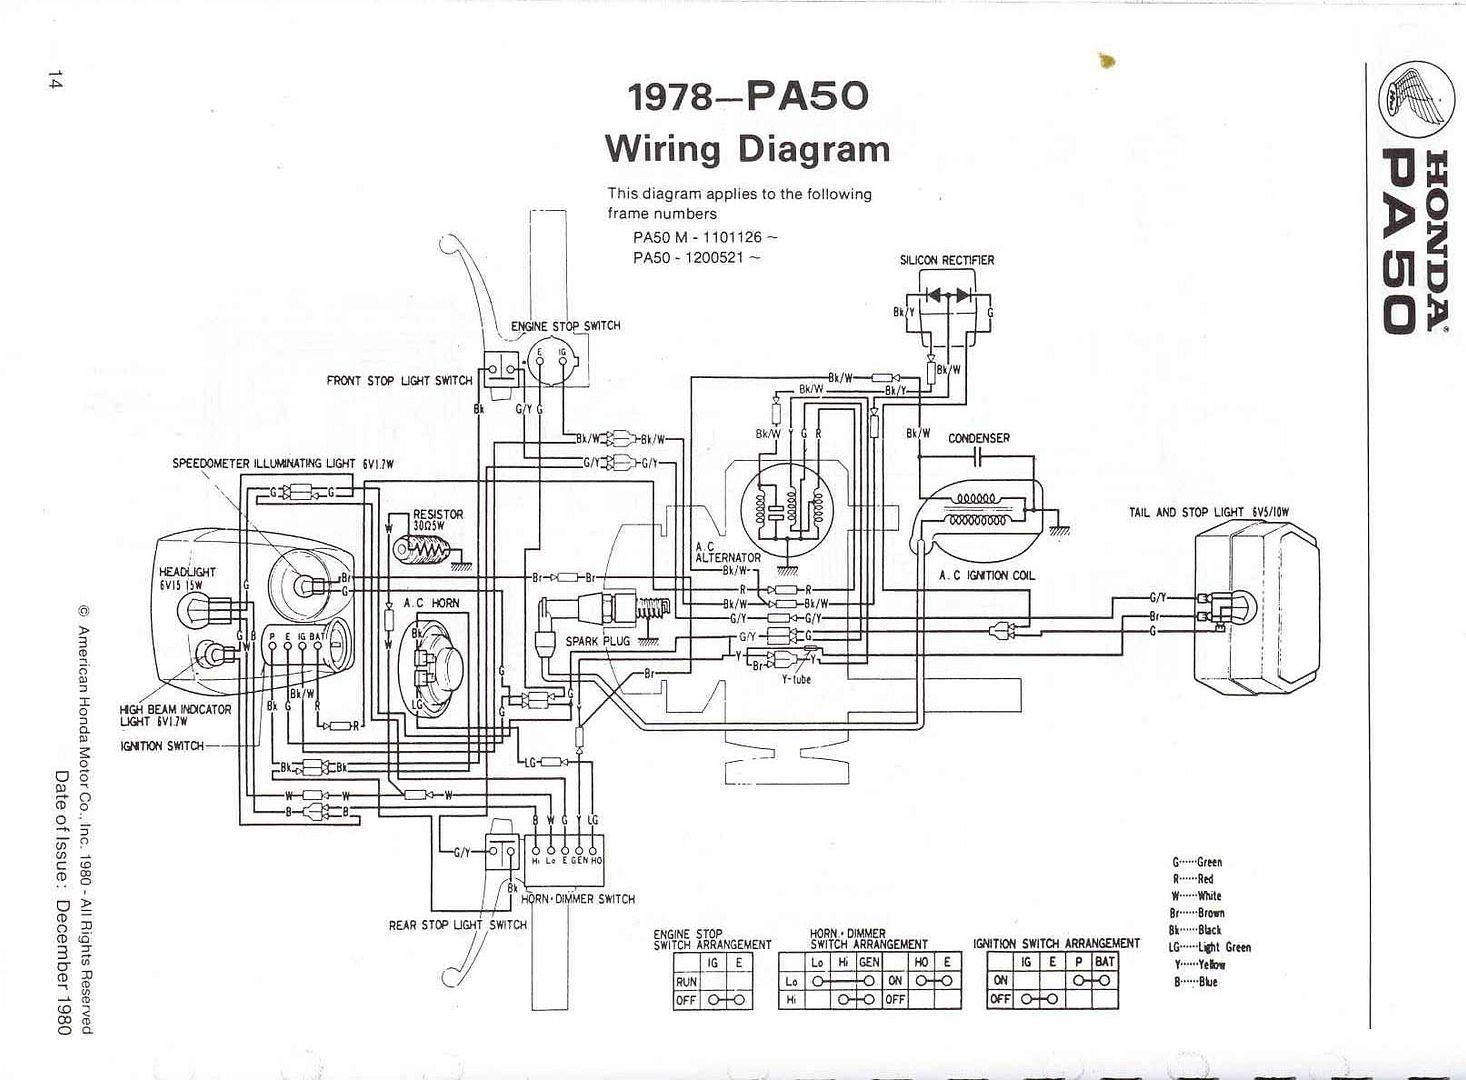 Acdelco Mu1614 Wiring Diagram Dc Motor Forward Reverse Wiring Diagram Begeboy Wiring Diagram Source